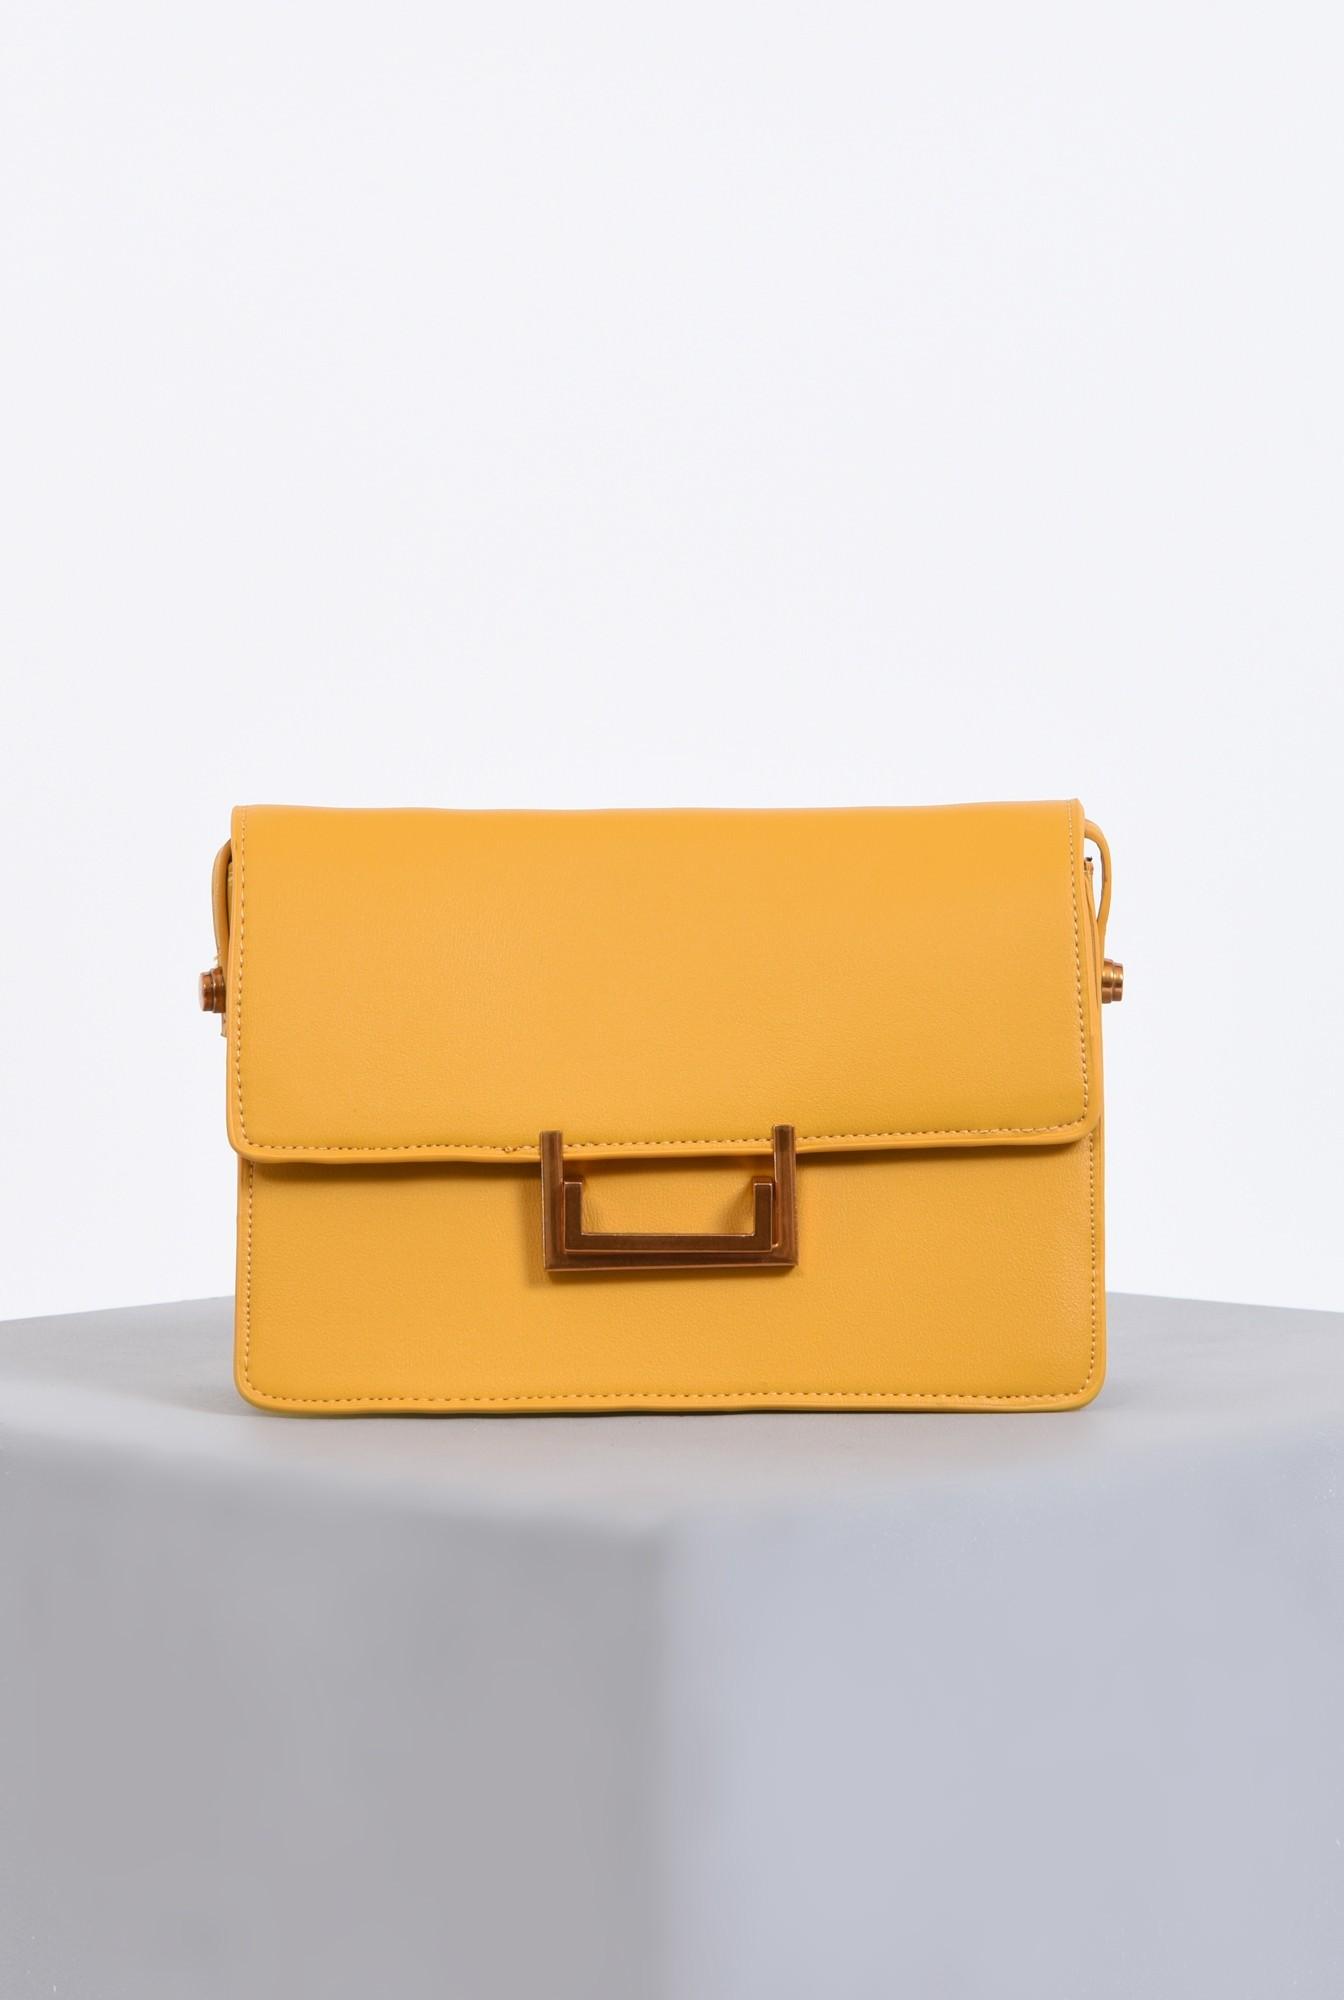 0 - geanta casual, mustar, medie, accesorii